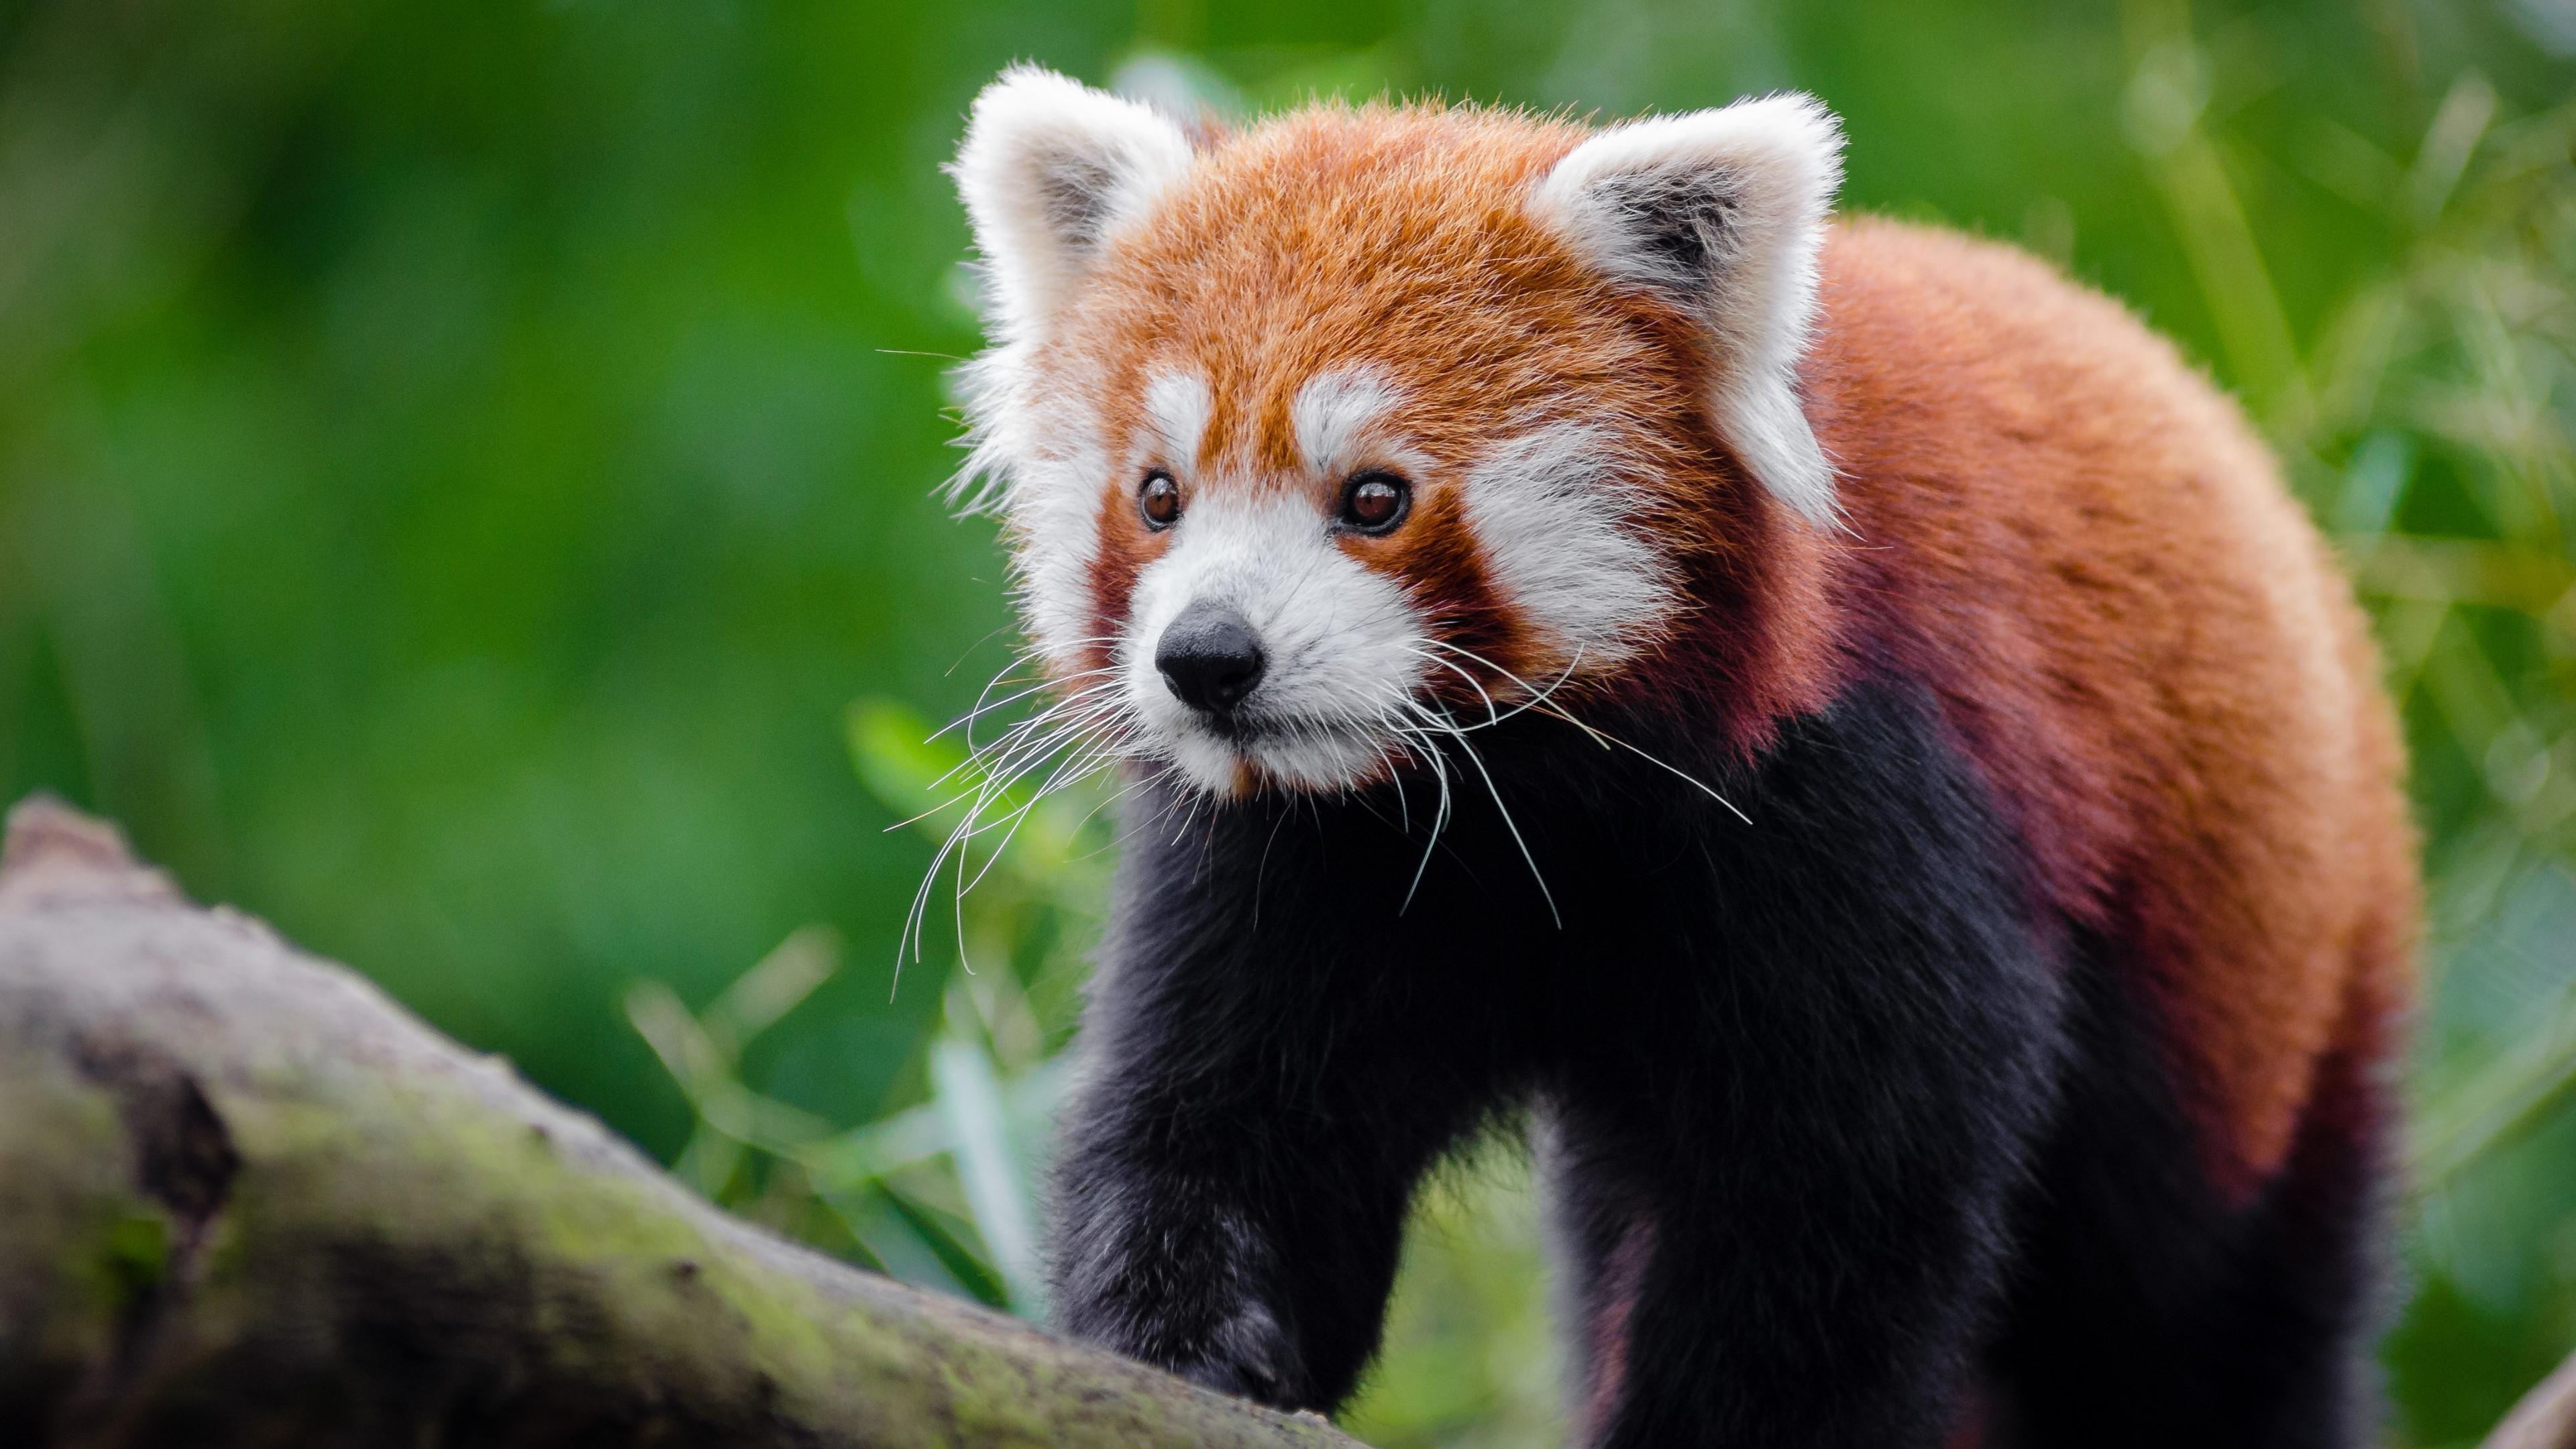 Res: 3840x2160, Red Panda HD: Reality Red Panda HD Photos